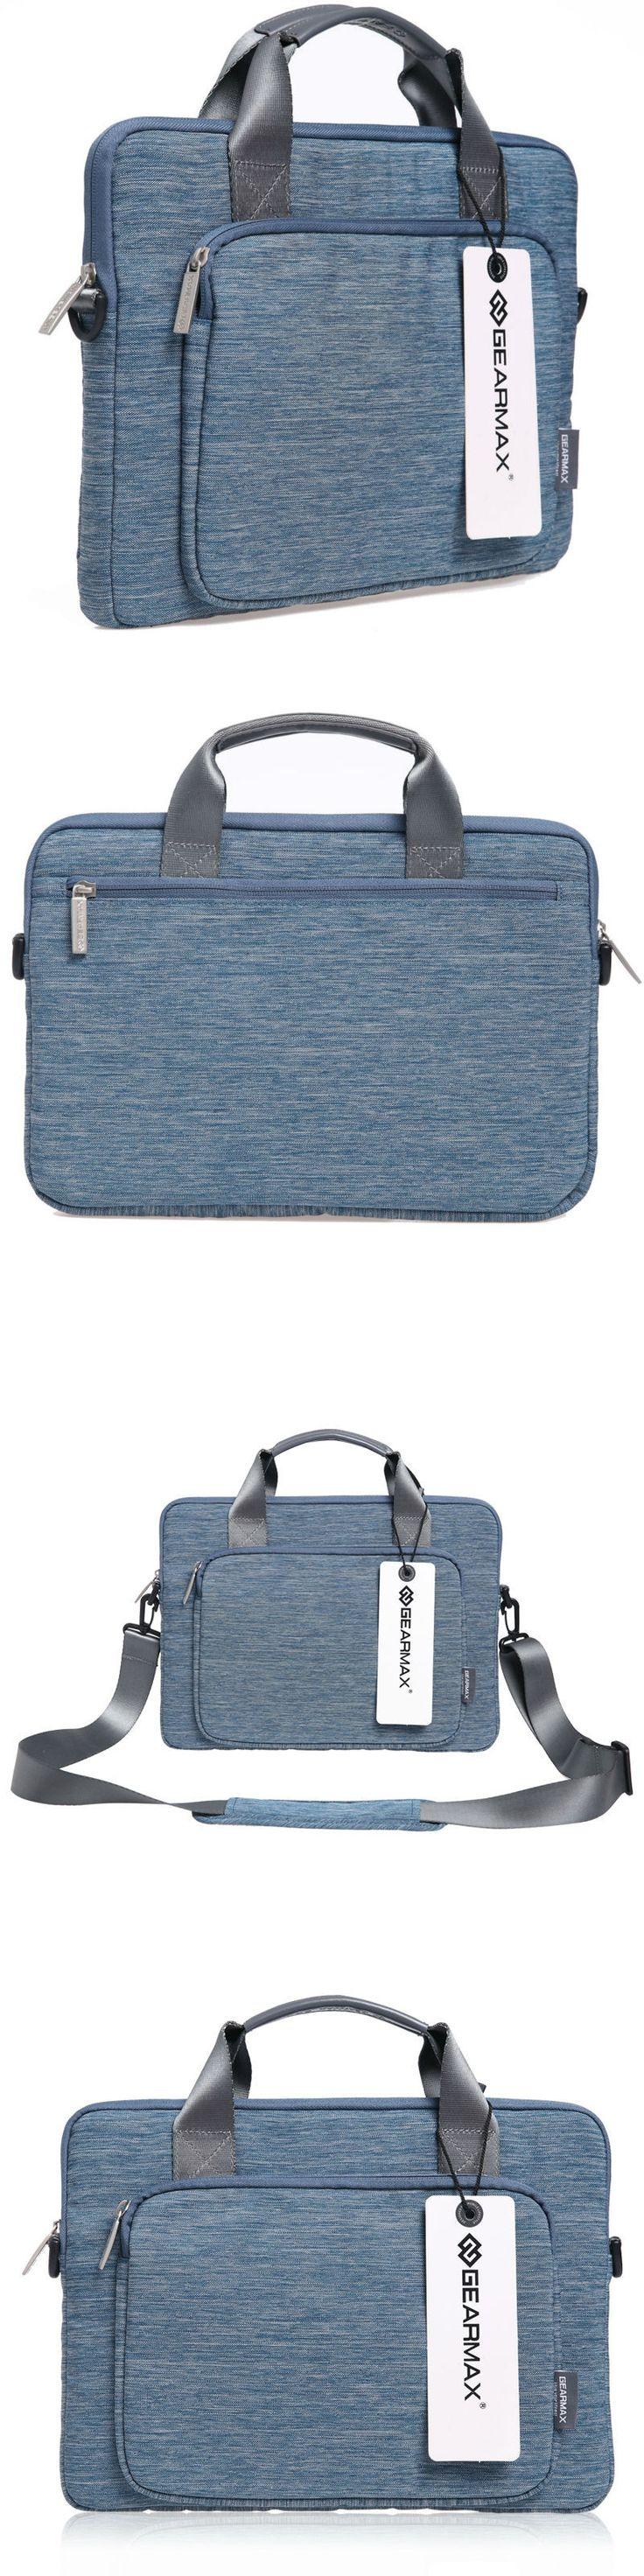 2017 Top Selling Male Bag for MacBook Pro 17 Inch Wholesale Price  Women's Handbags Shoulder Laptop Case for MacBook Air 13